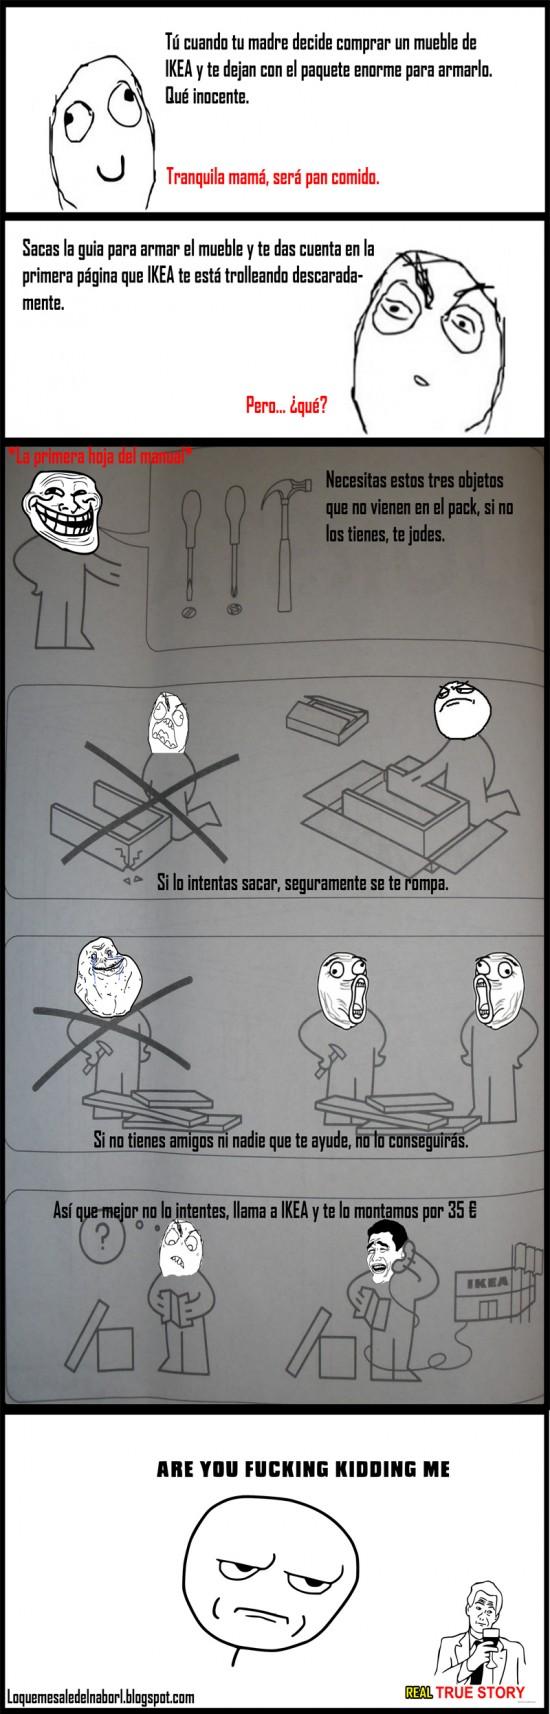 Kidding_me - IKEA te trollea